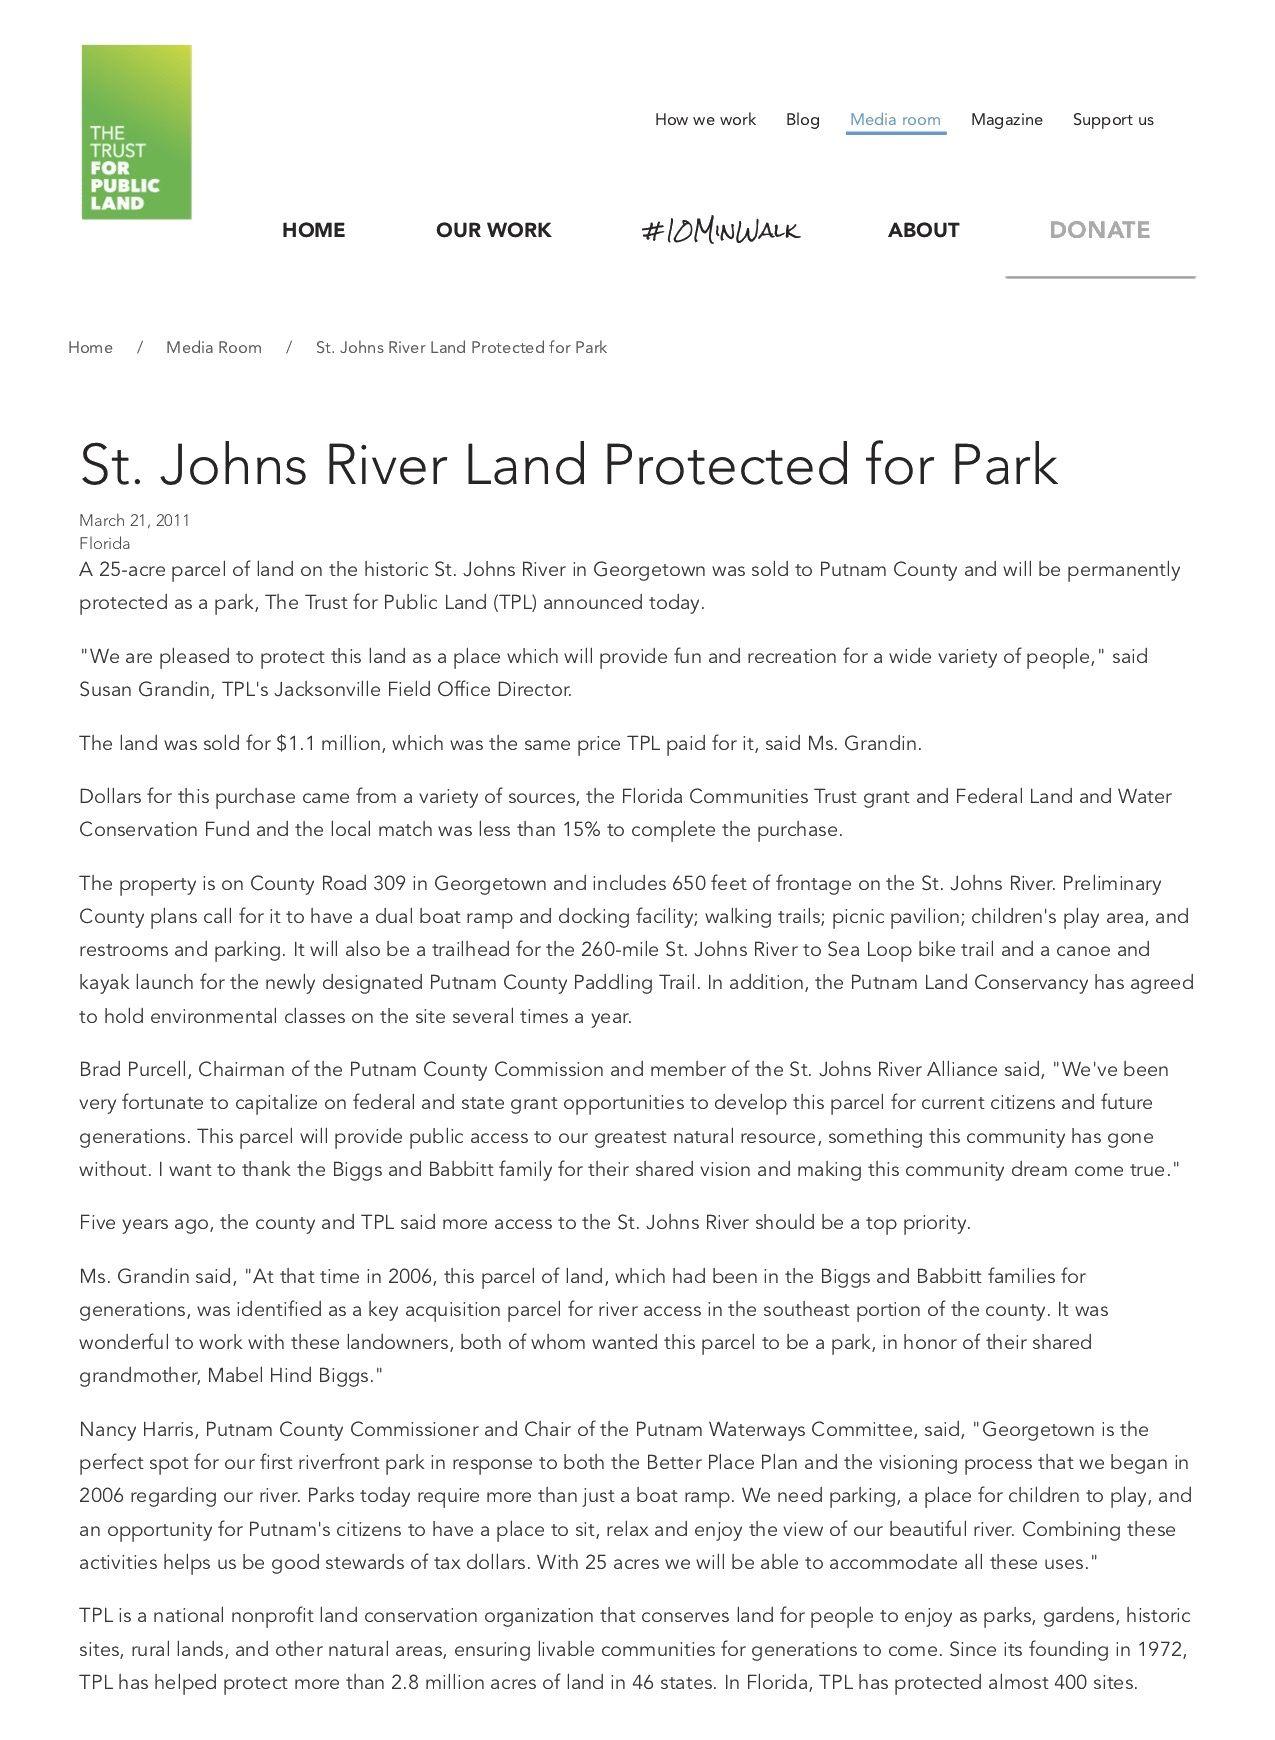 St Johns River Land Protected For Park Trust For Public Land River Park